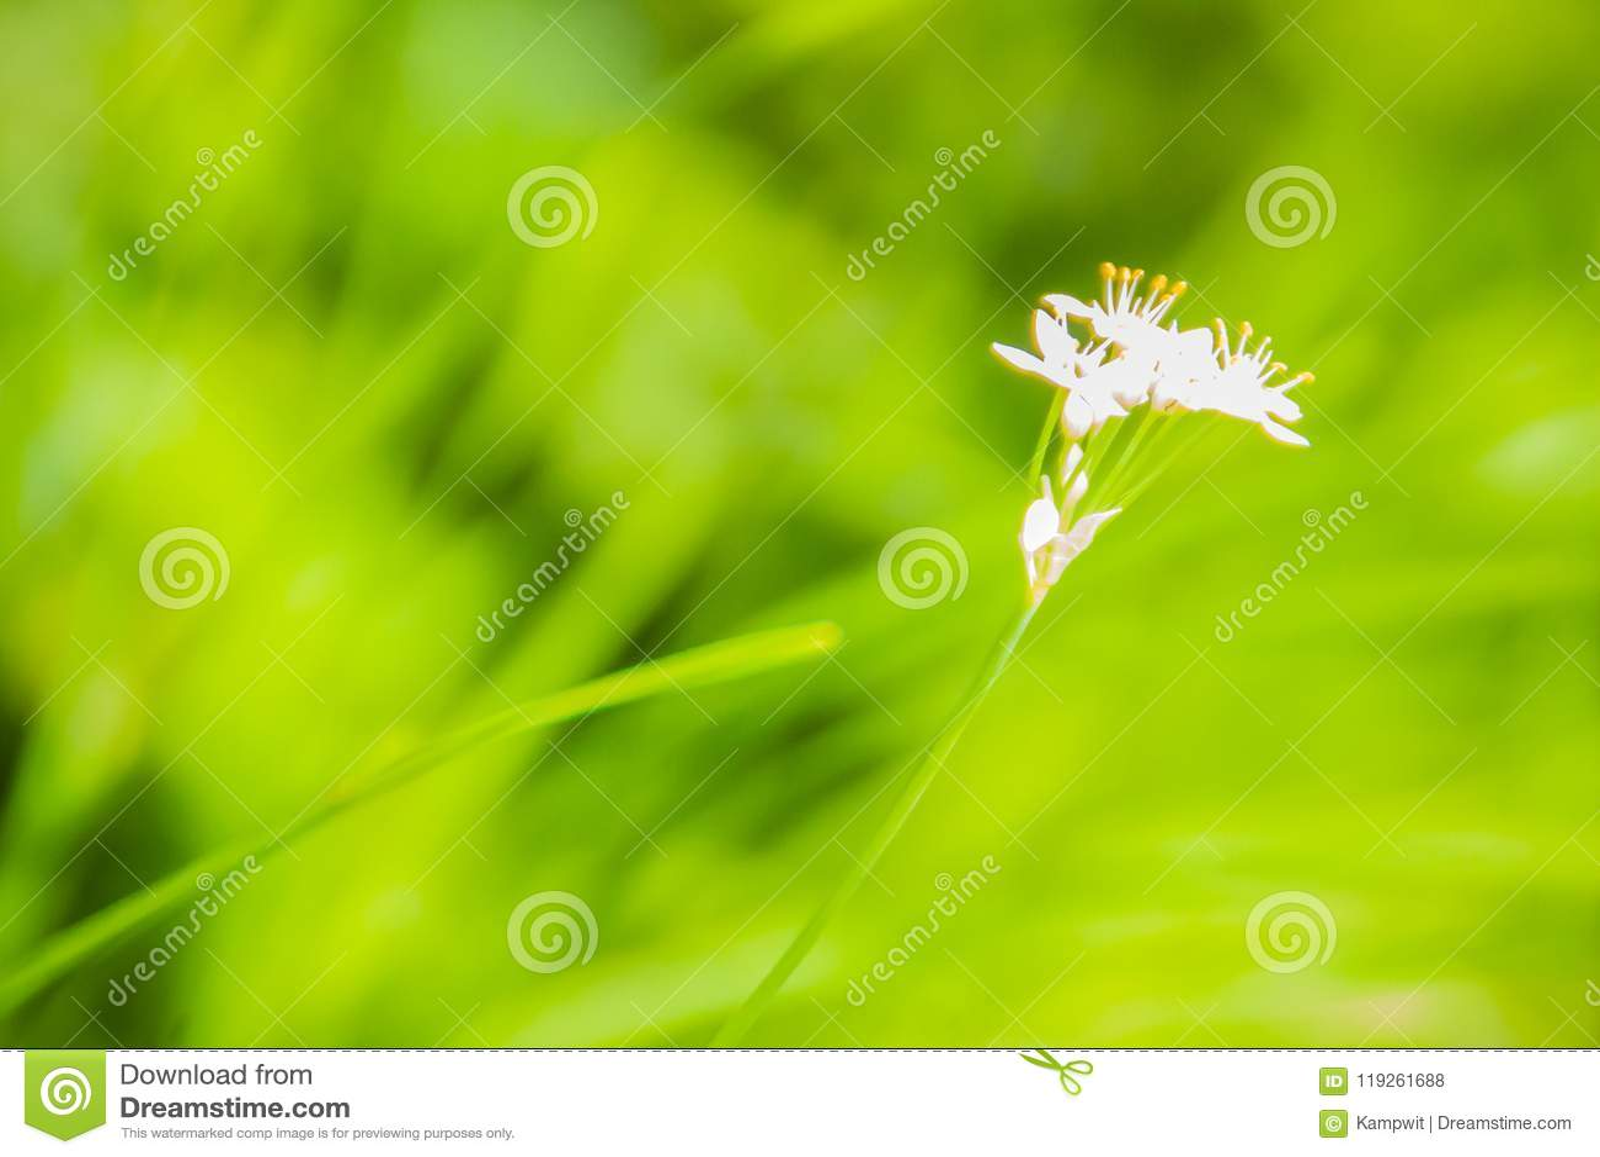 Красивый белый цветок tuberosum лукабатуна (chives чеснока, восточного чеснока, азиатских chives, китайских chives, китайского лу